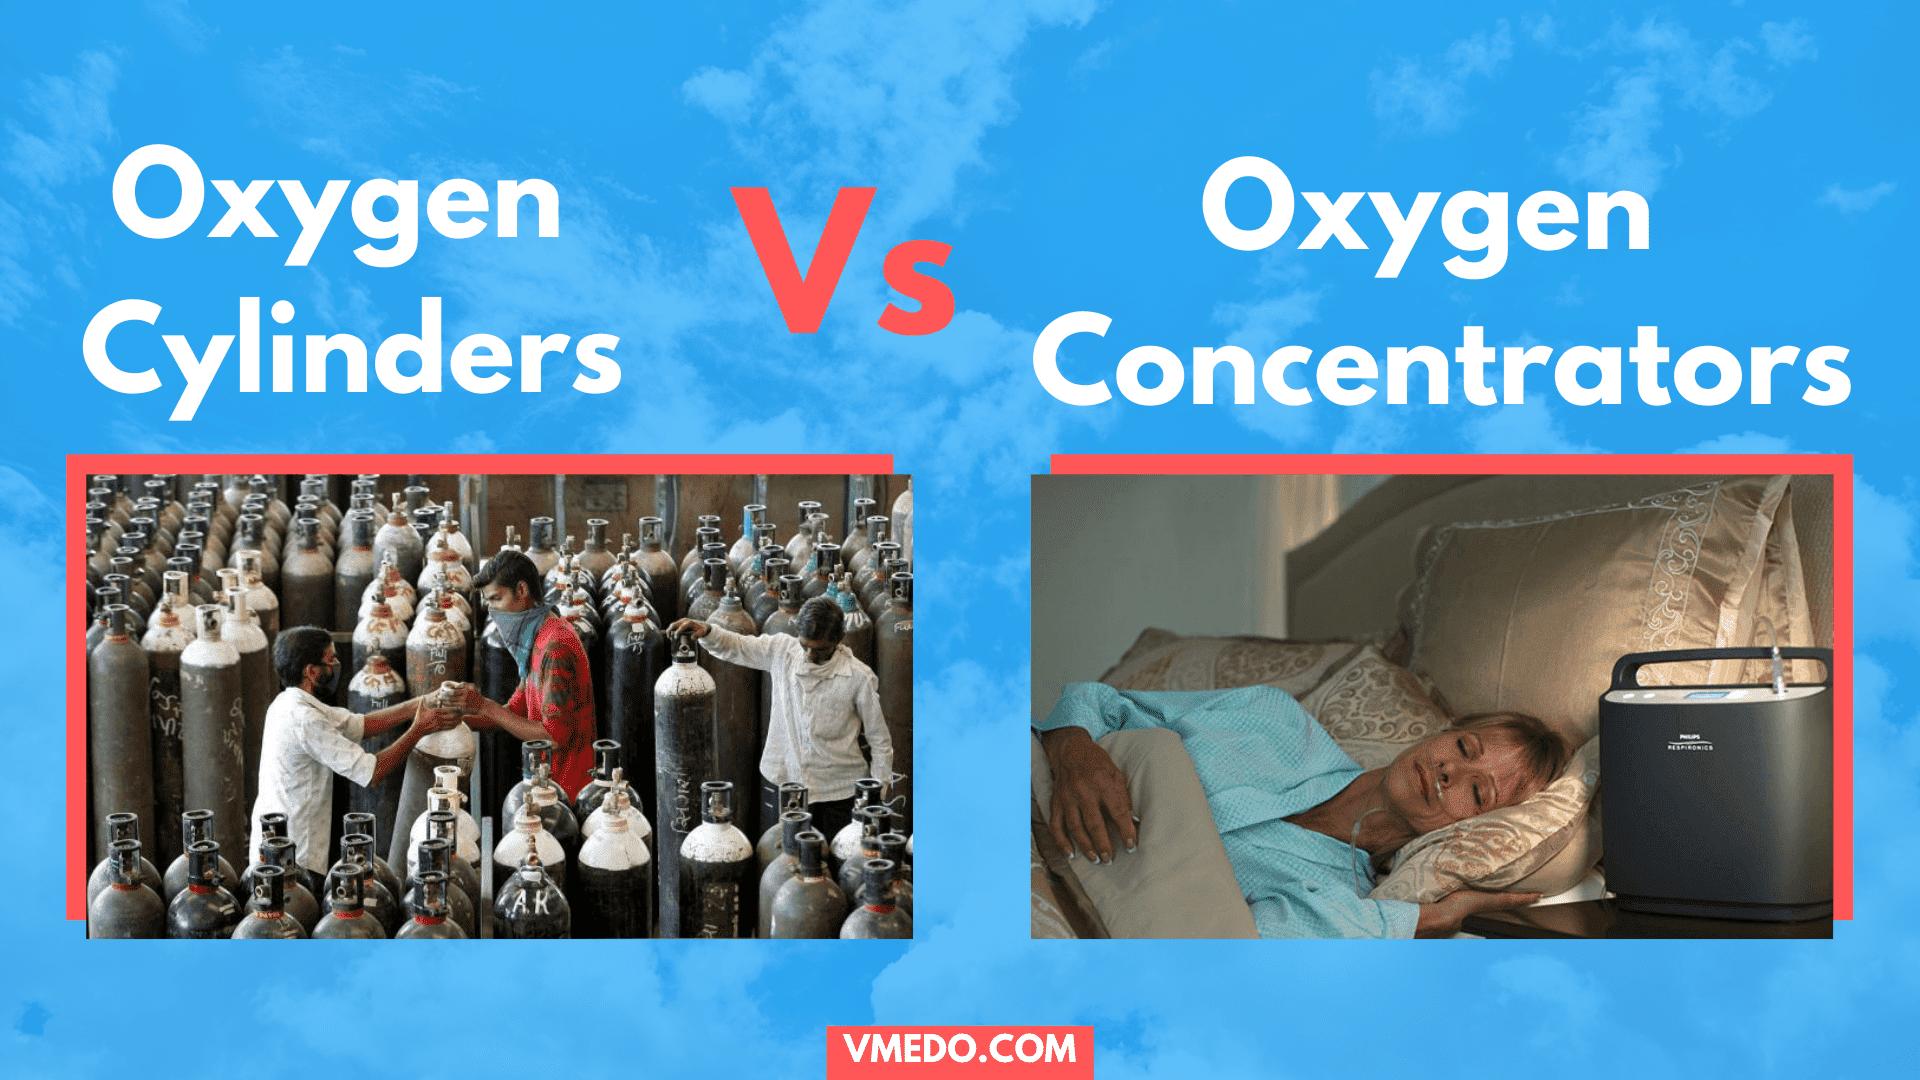 Oxygen cylinders vs oxygen concentrators